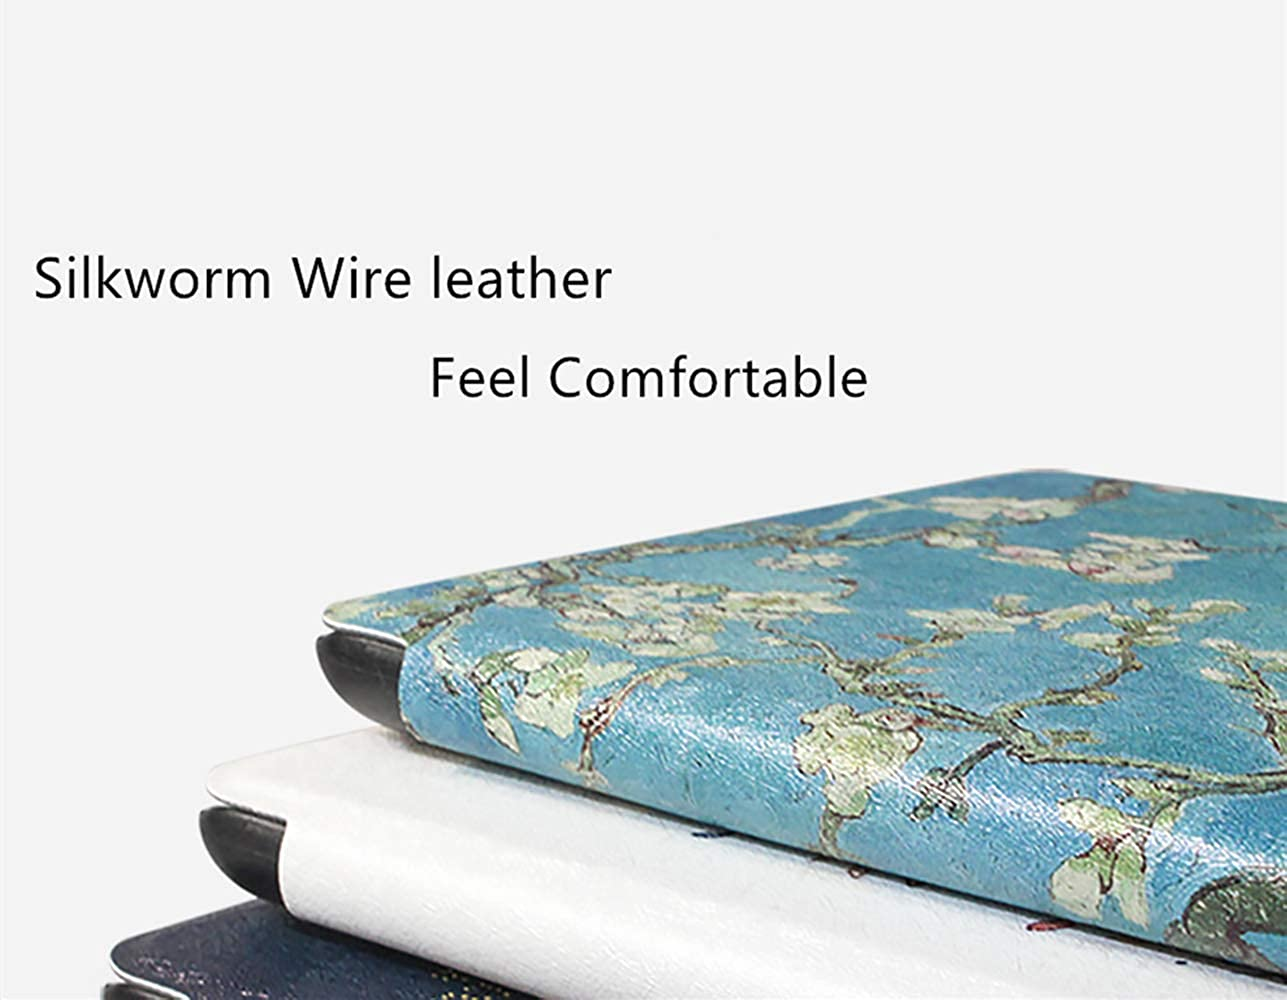 Fundas  Kindle Paperwhite 1 2 3 4 Flip Pintado Carcasa Cuero PC 360/° Proteccion Ultra-Delgado Magn/ética Autom/ático Despertar o Dormir Funci/ón Estuche para  Kindle